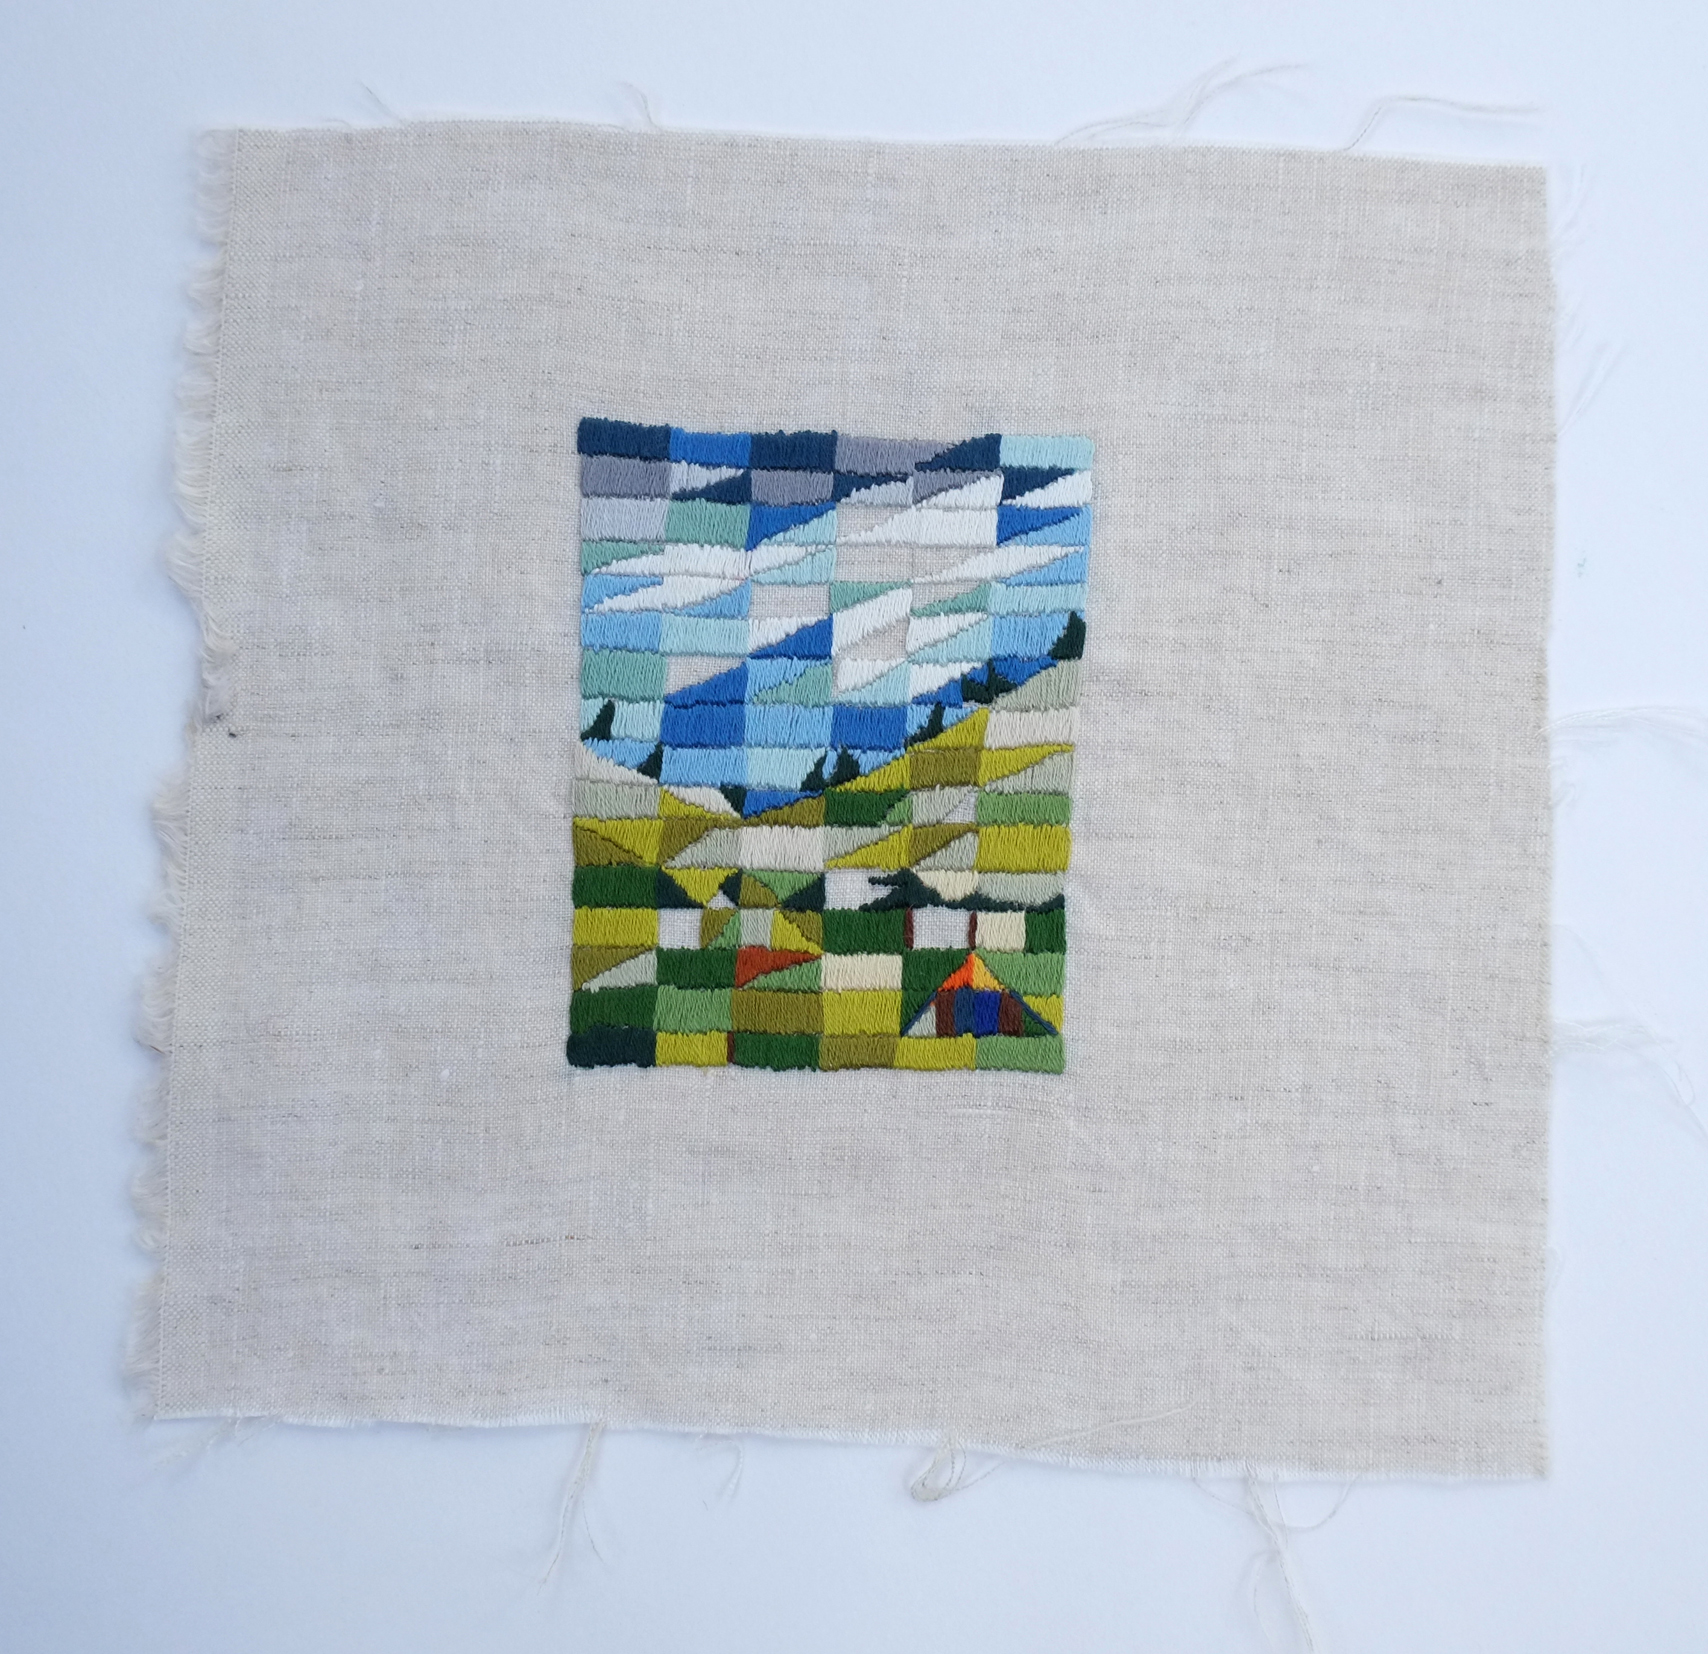 Glen Forbes  2014   cotton thread on linen   22 x 21cm